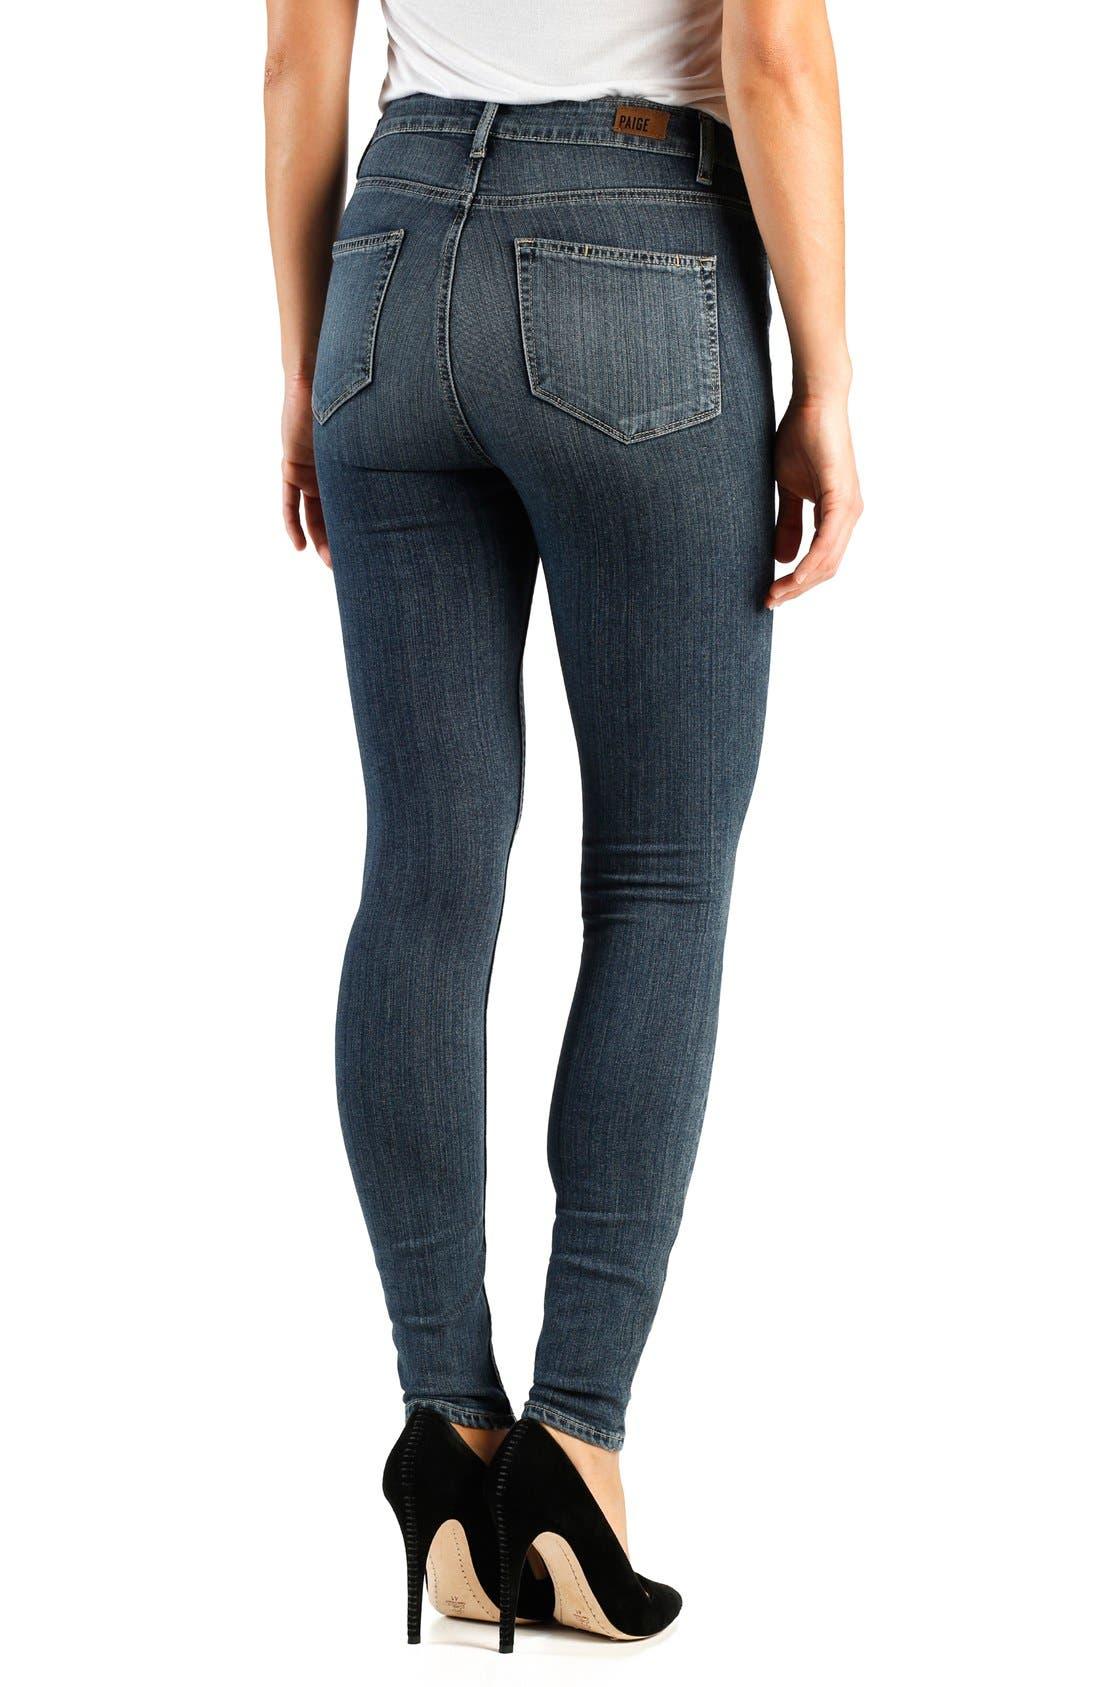 Alternate Image 2  - Paige Denim 'Transcend - Margot' High Rise Ultra Skinny Jeans (Atlas)